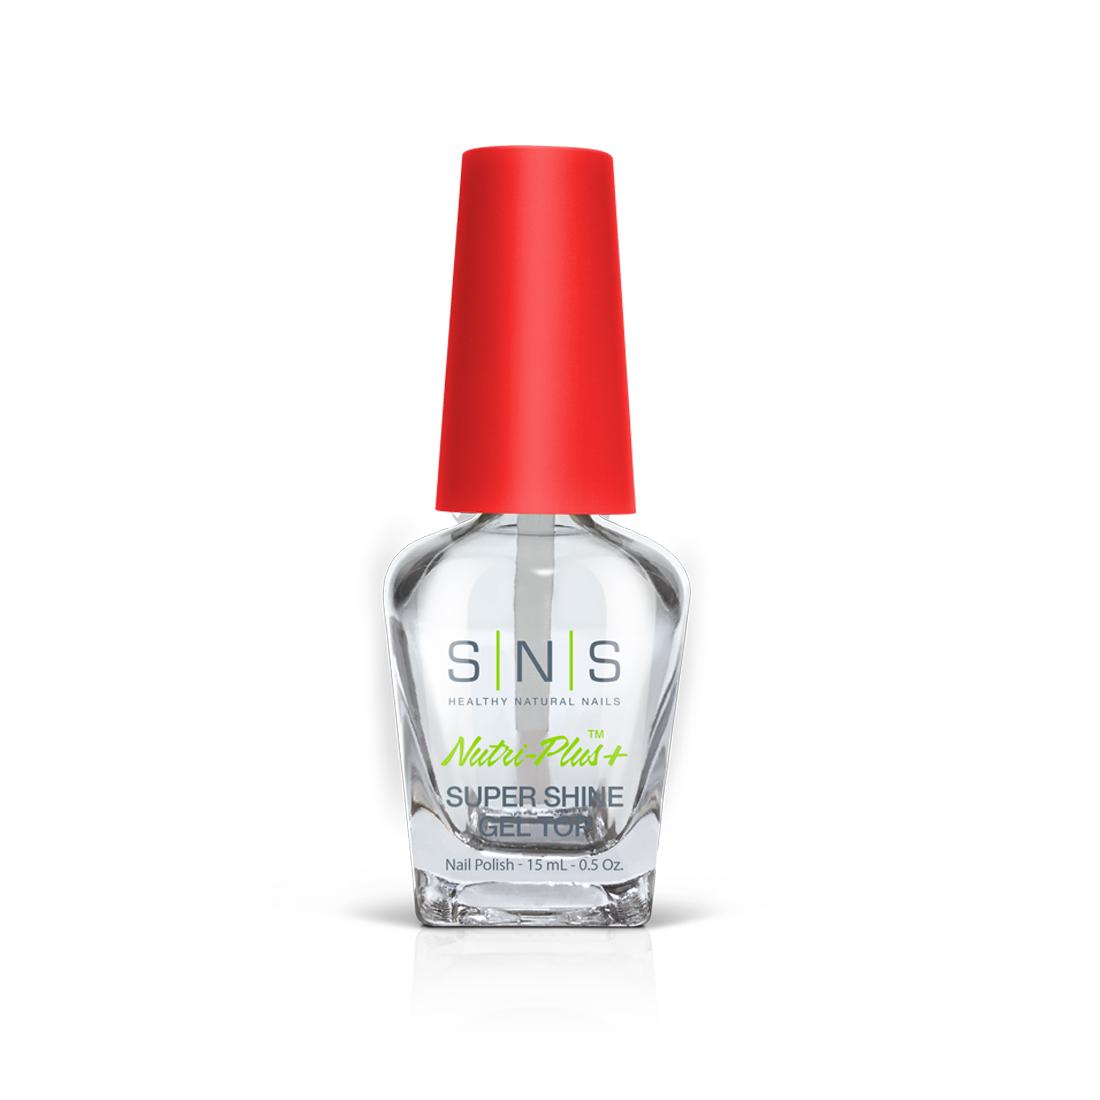 SNS - BRUSH SAVER - 15ml - VL London Nails Supply